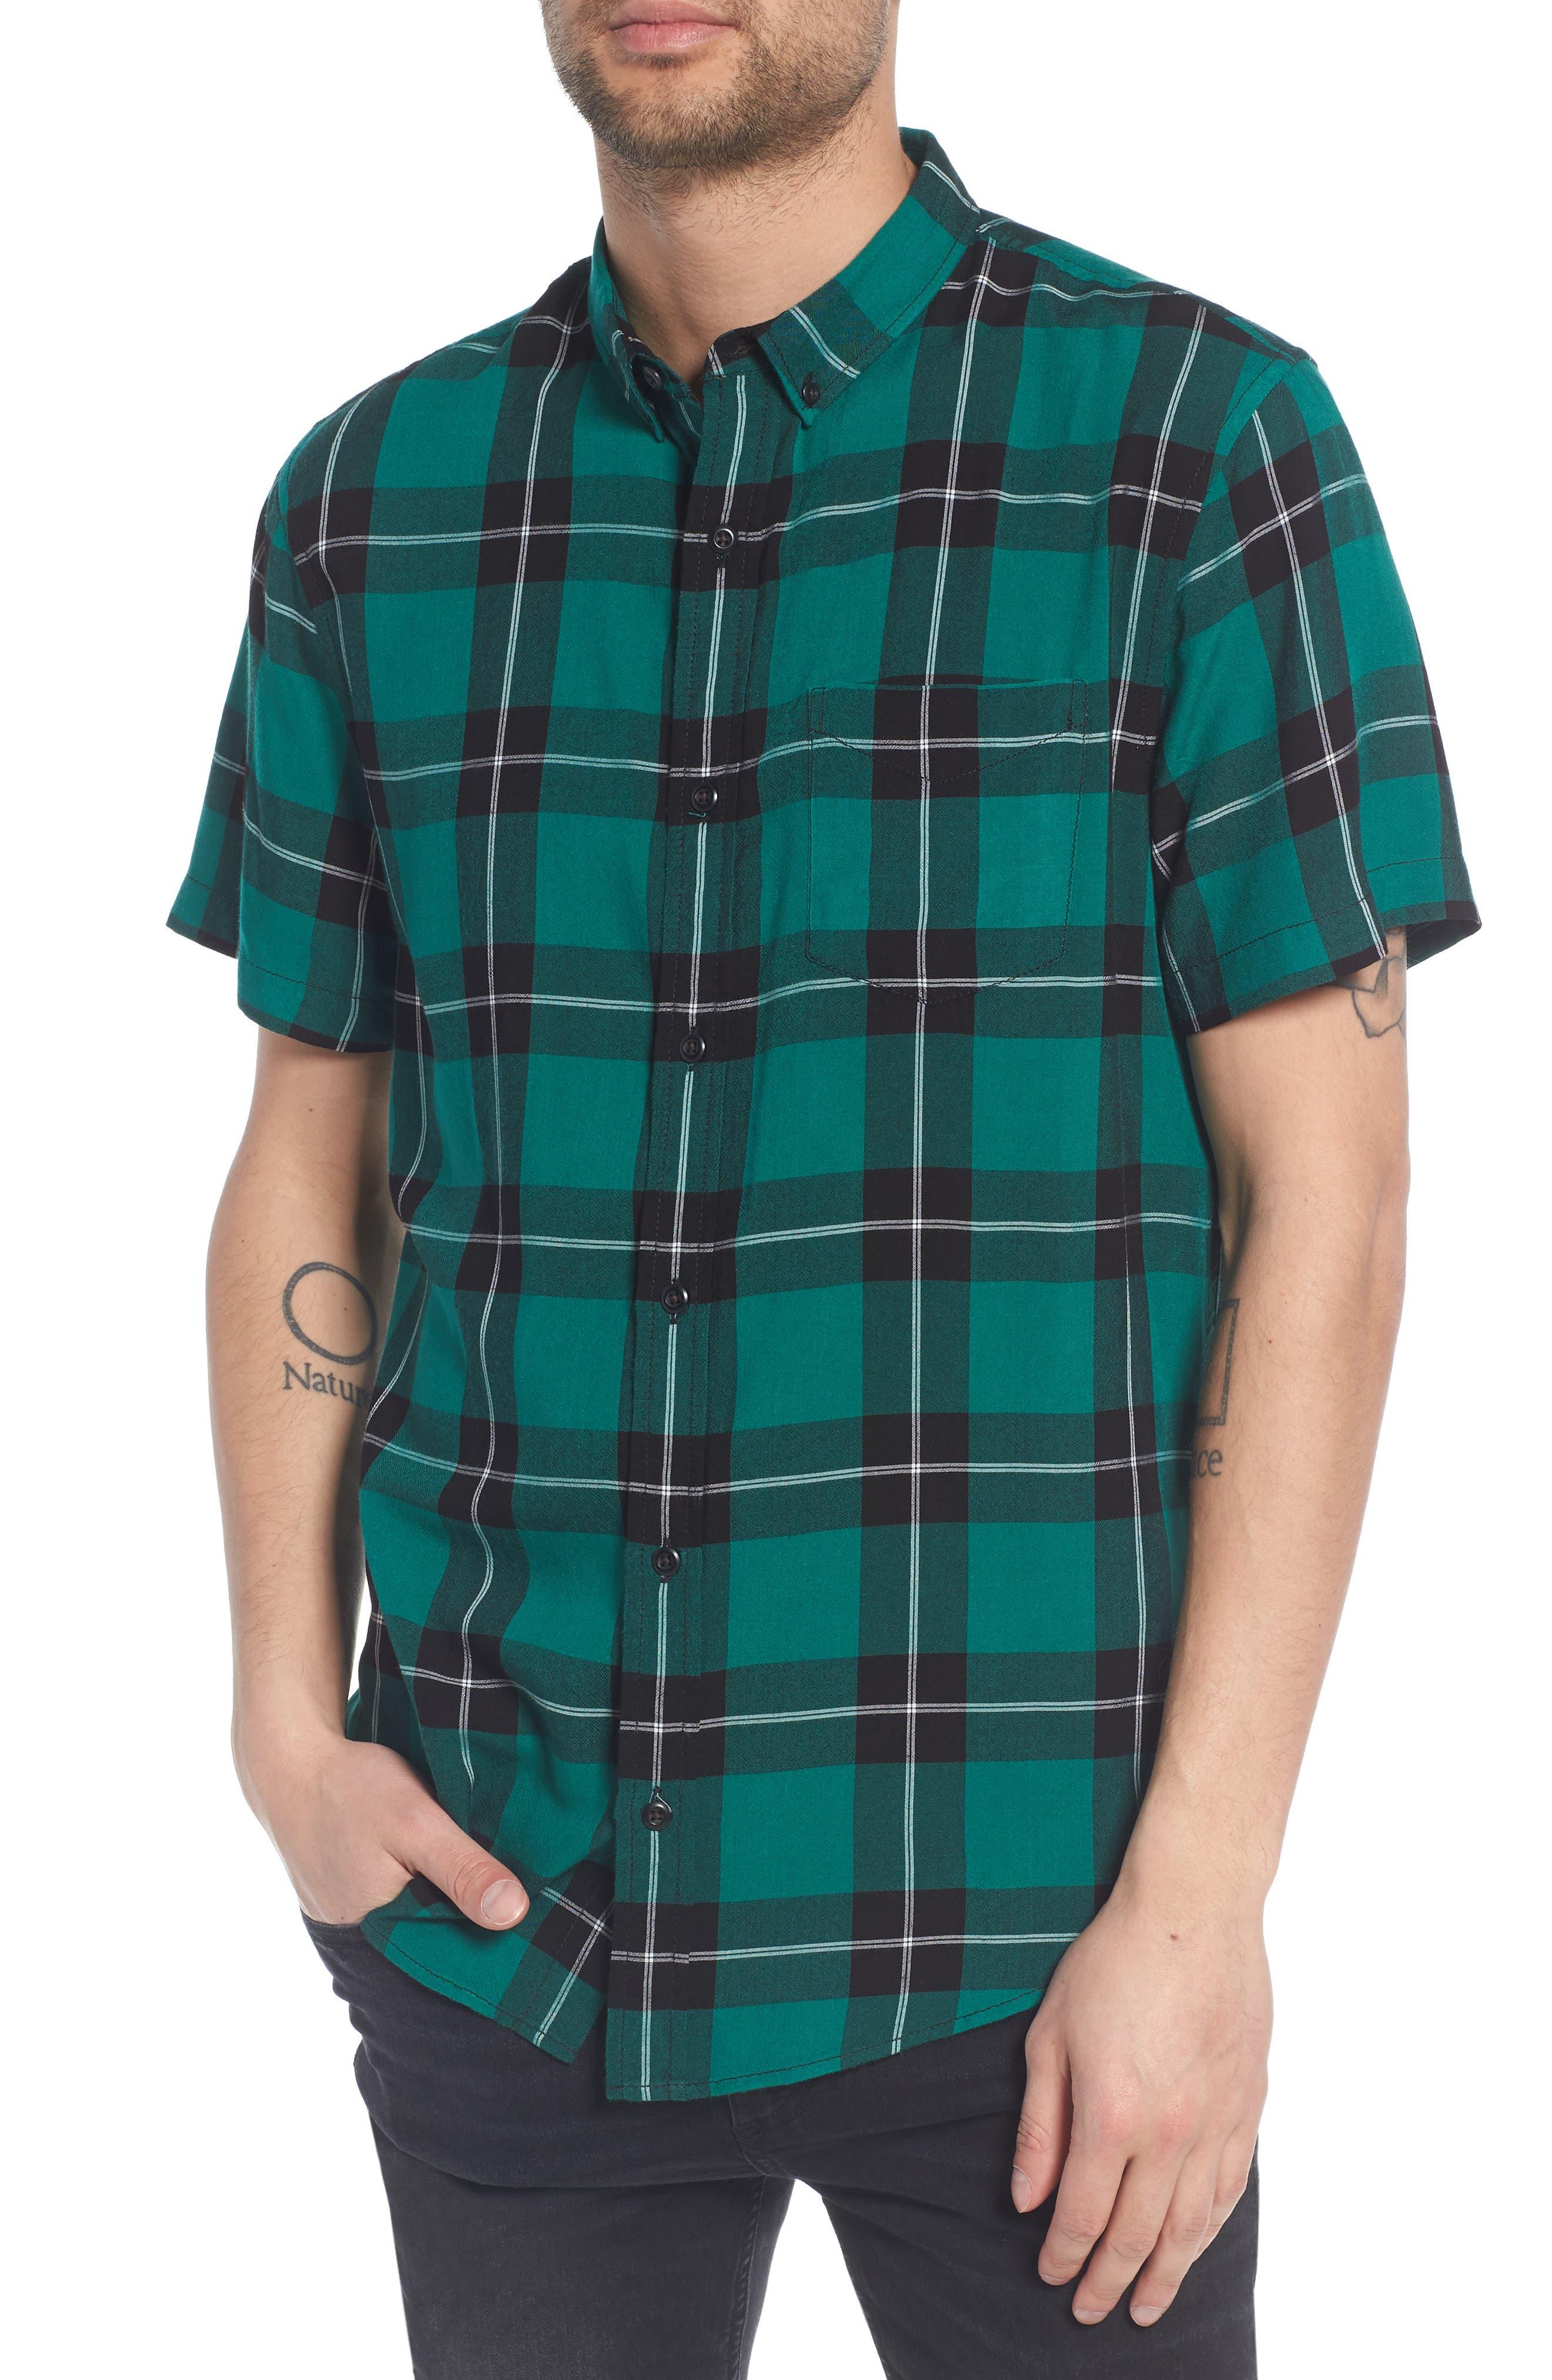 Yarn Dyed Plaid Shirt,                         Main,                         color, BLACK GREEN LIV PLAID